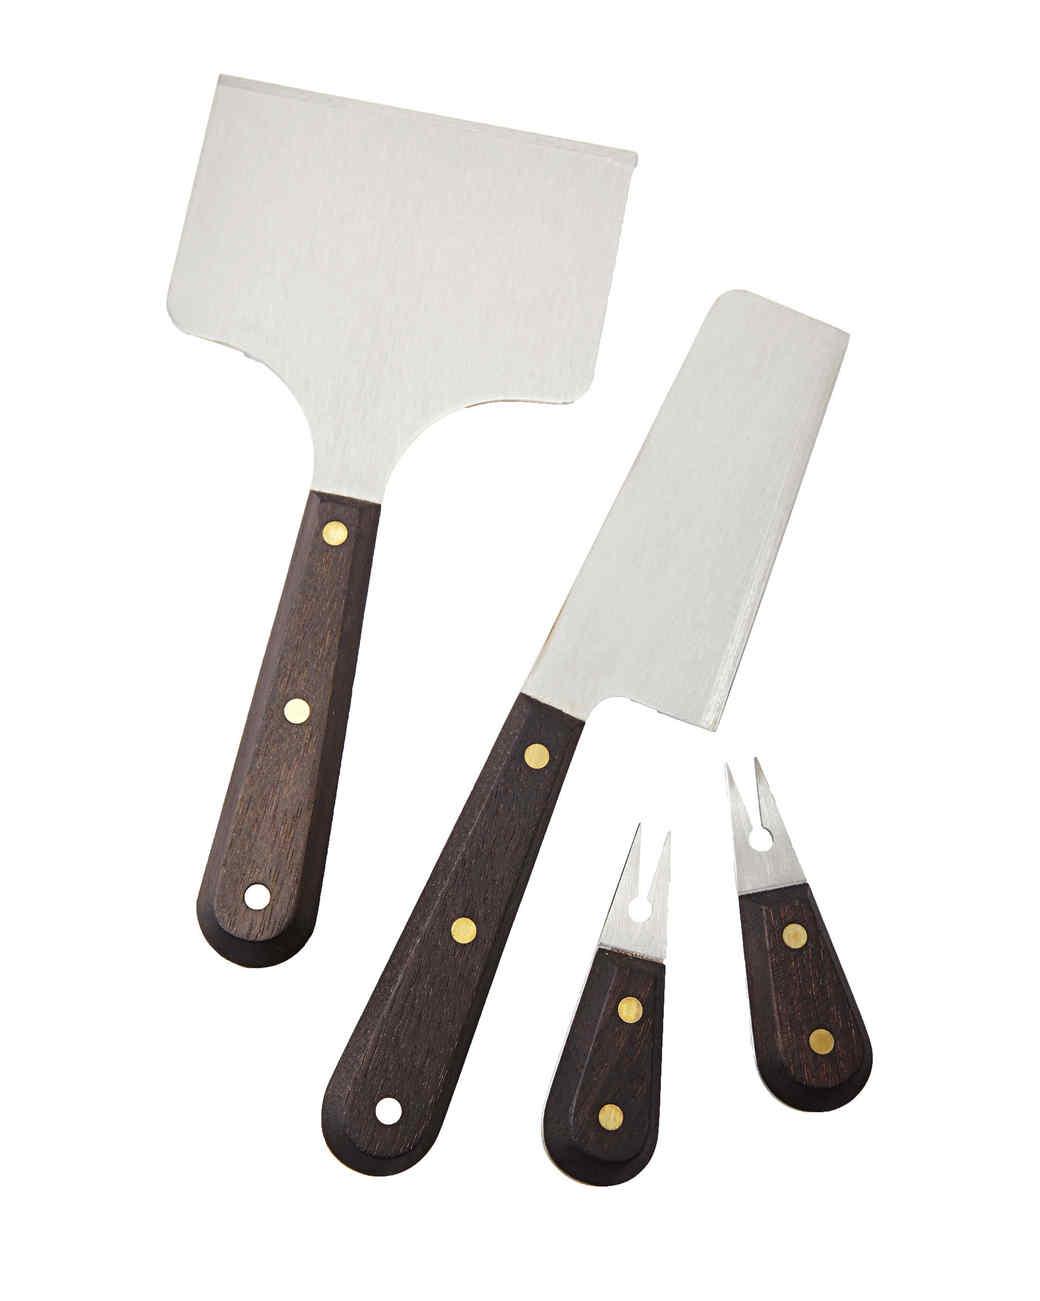 cheese utensils gift guide 2017 kitchen